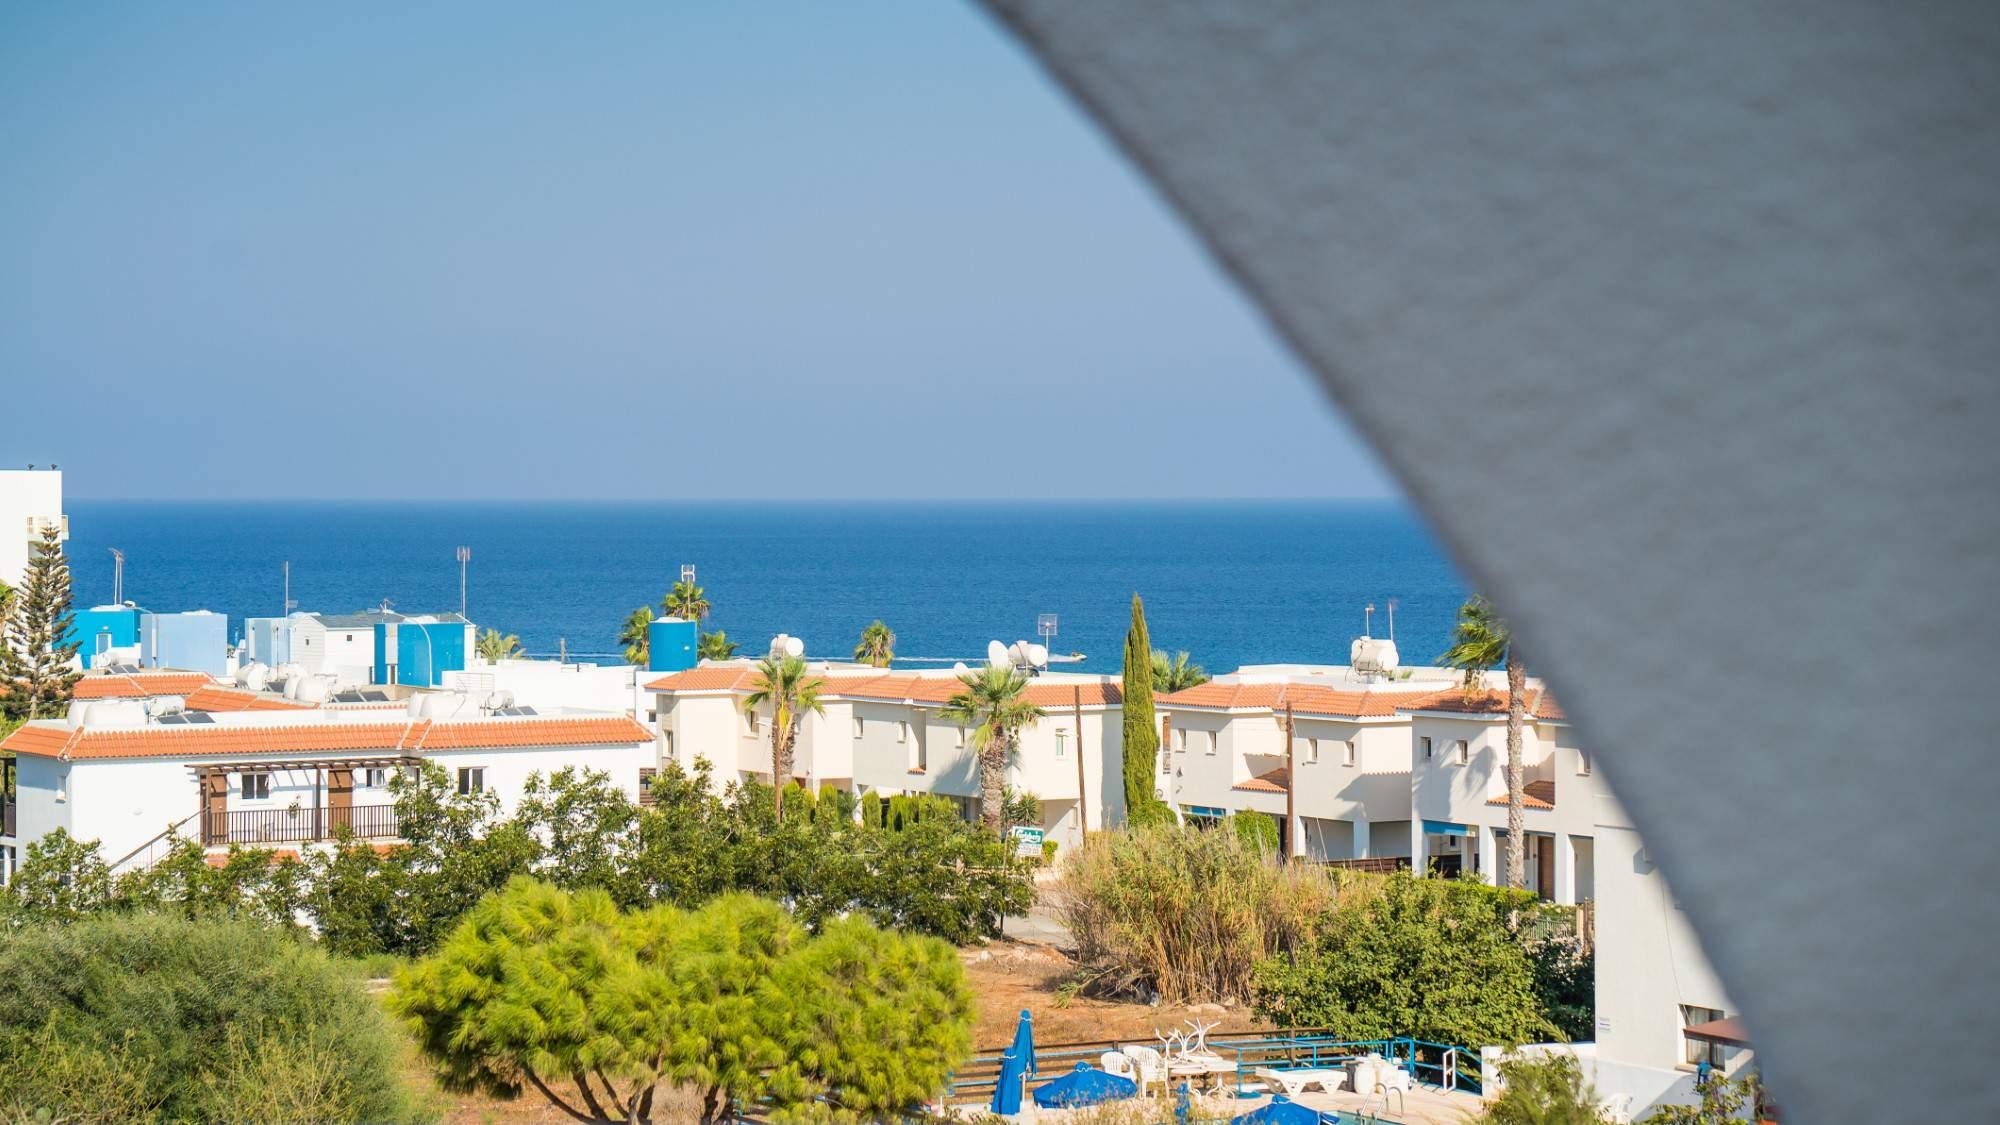 Andreotis Apartments sea view Kapparis